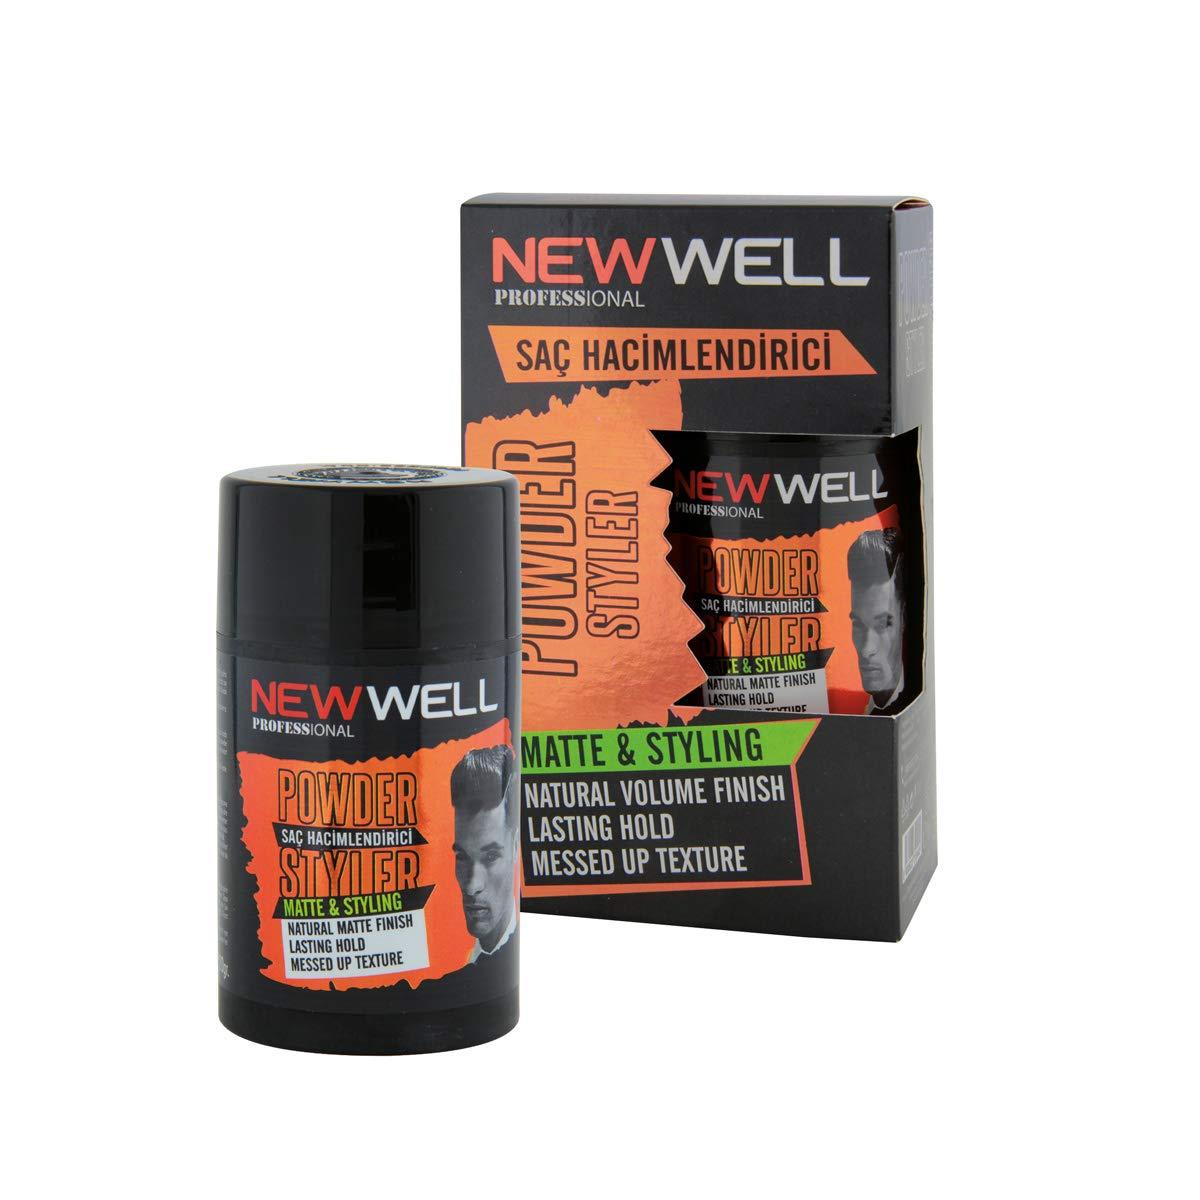 New Well Hair Volumizer Powder Styler Matte - Natural Volume Finish - Styling